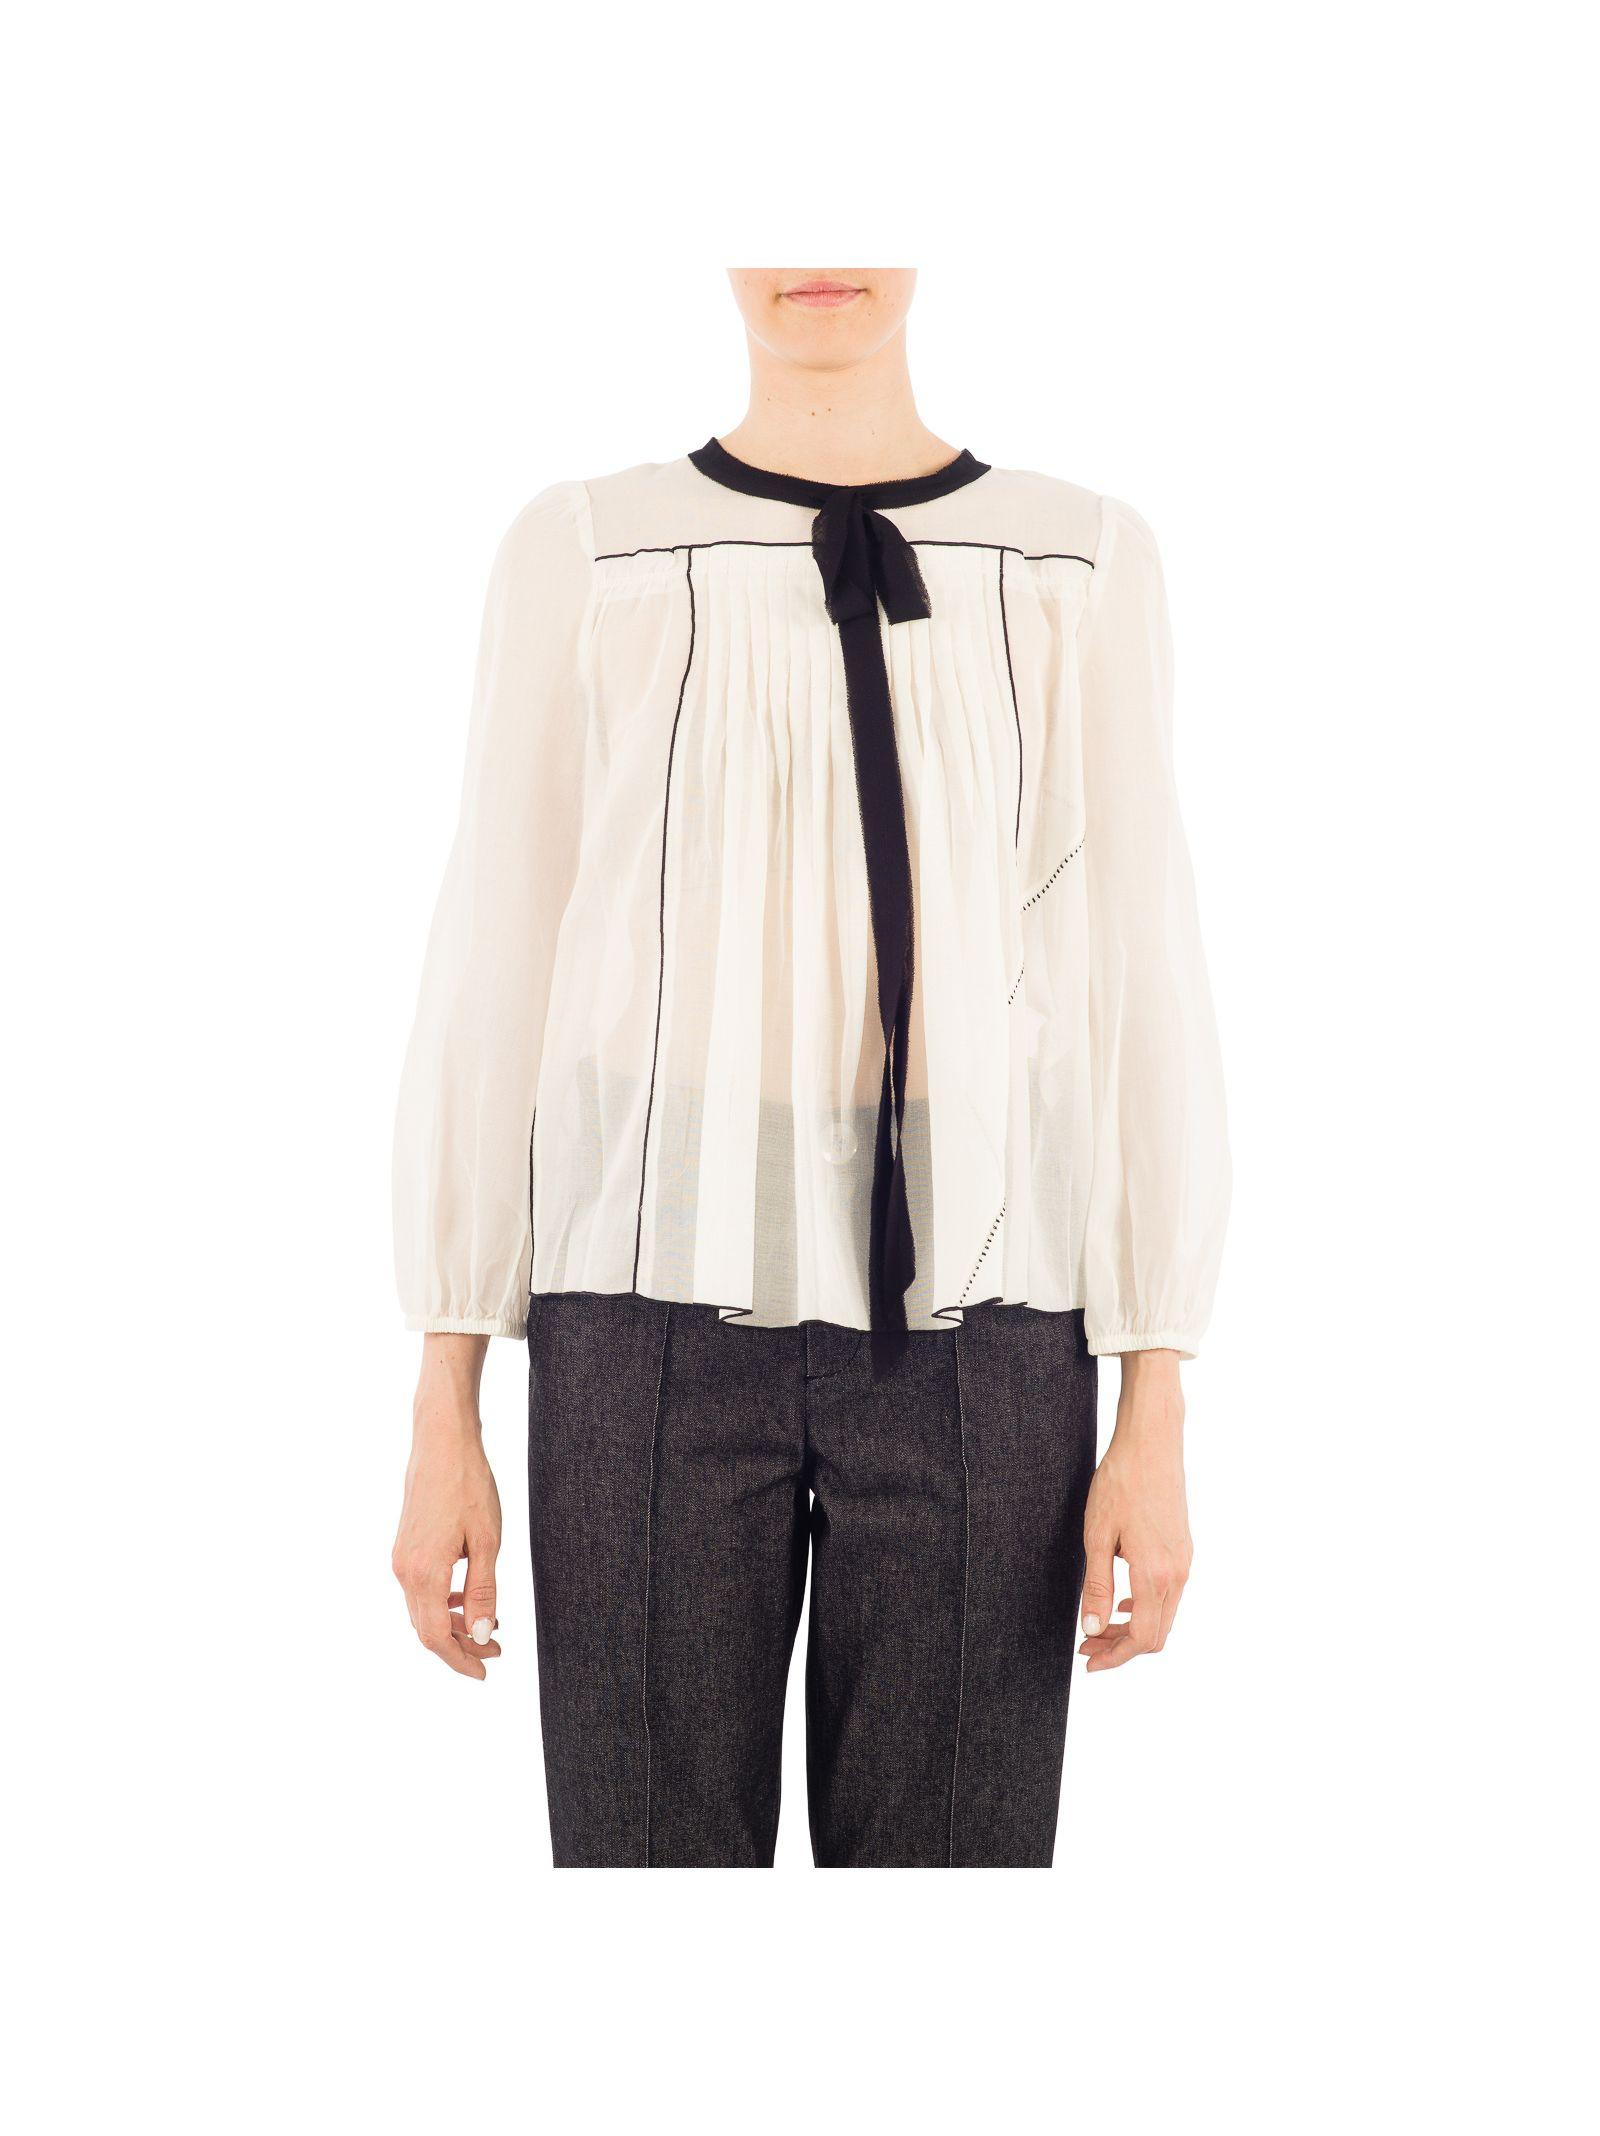 marc jacobs female marc jacobs white cotton shirt